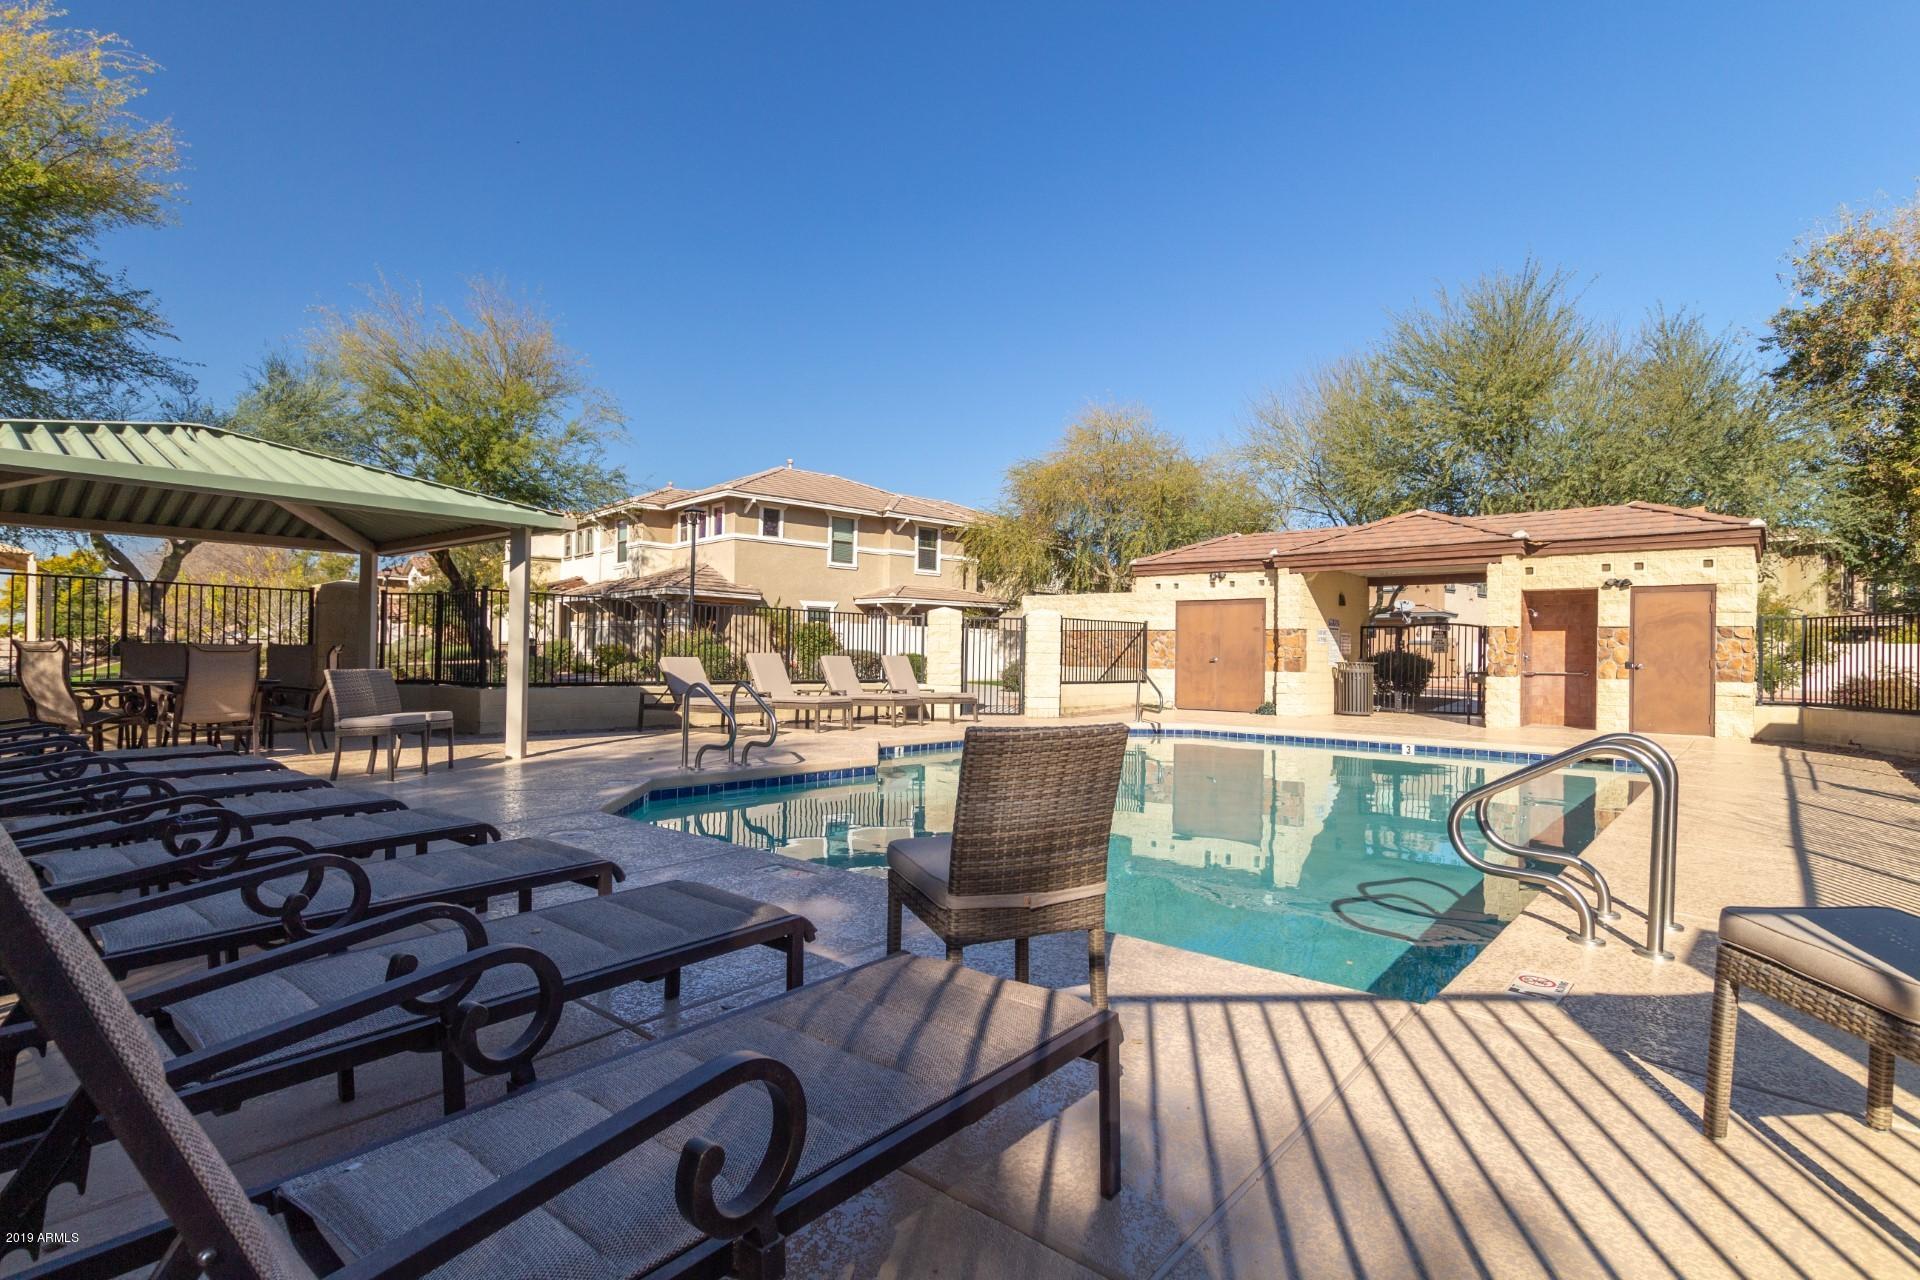 MLS 5877200 5812 E HOLMES Avenue, Mesa, AZ 85206 Mesa AZ Summerlin Village